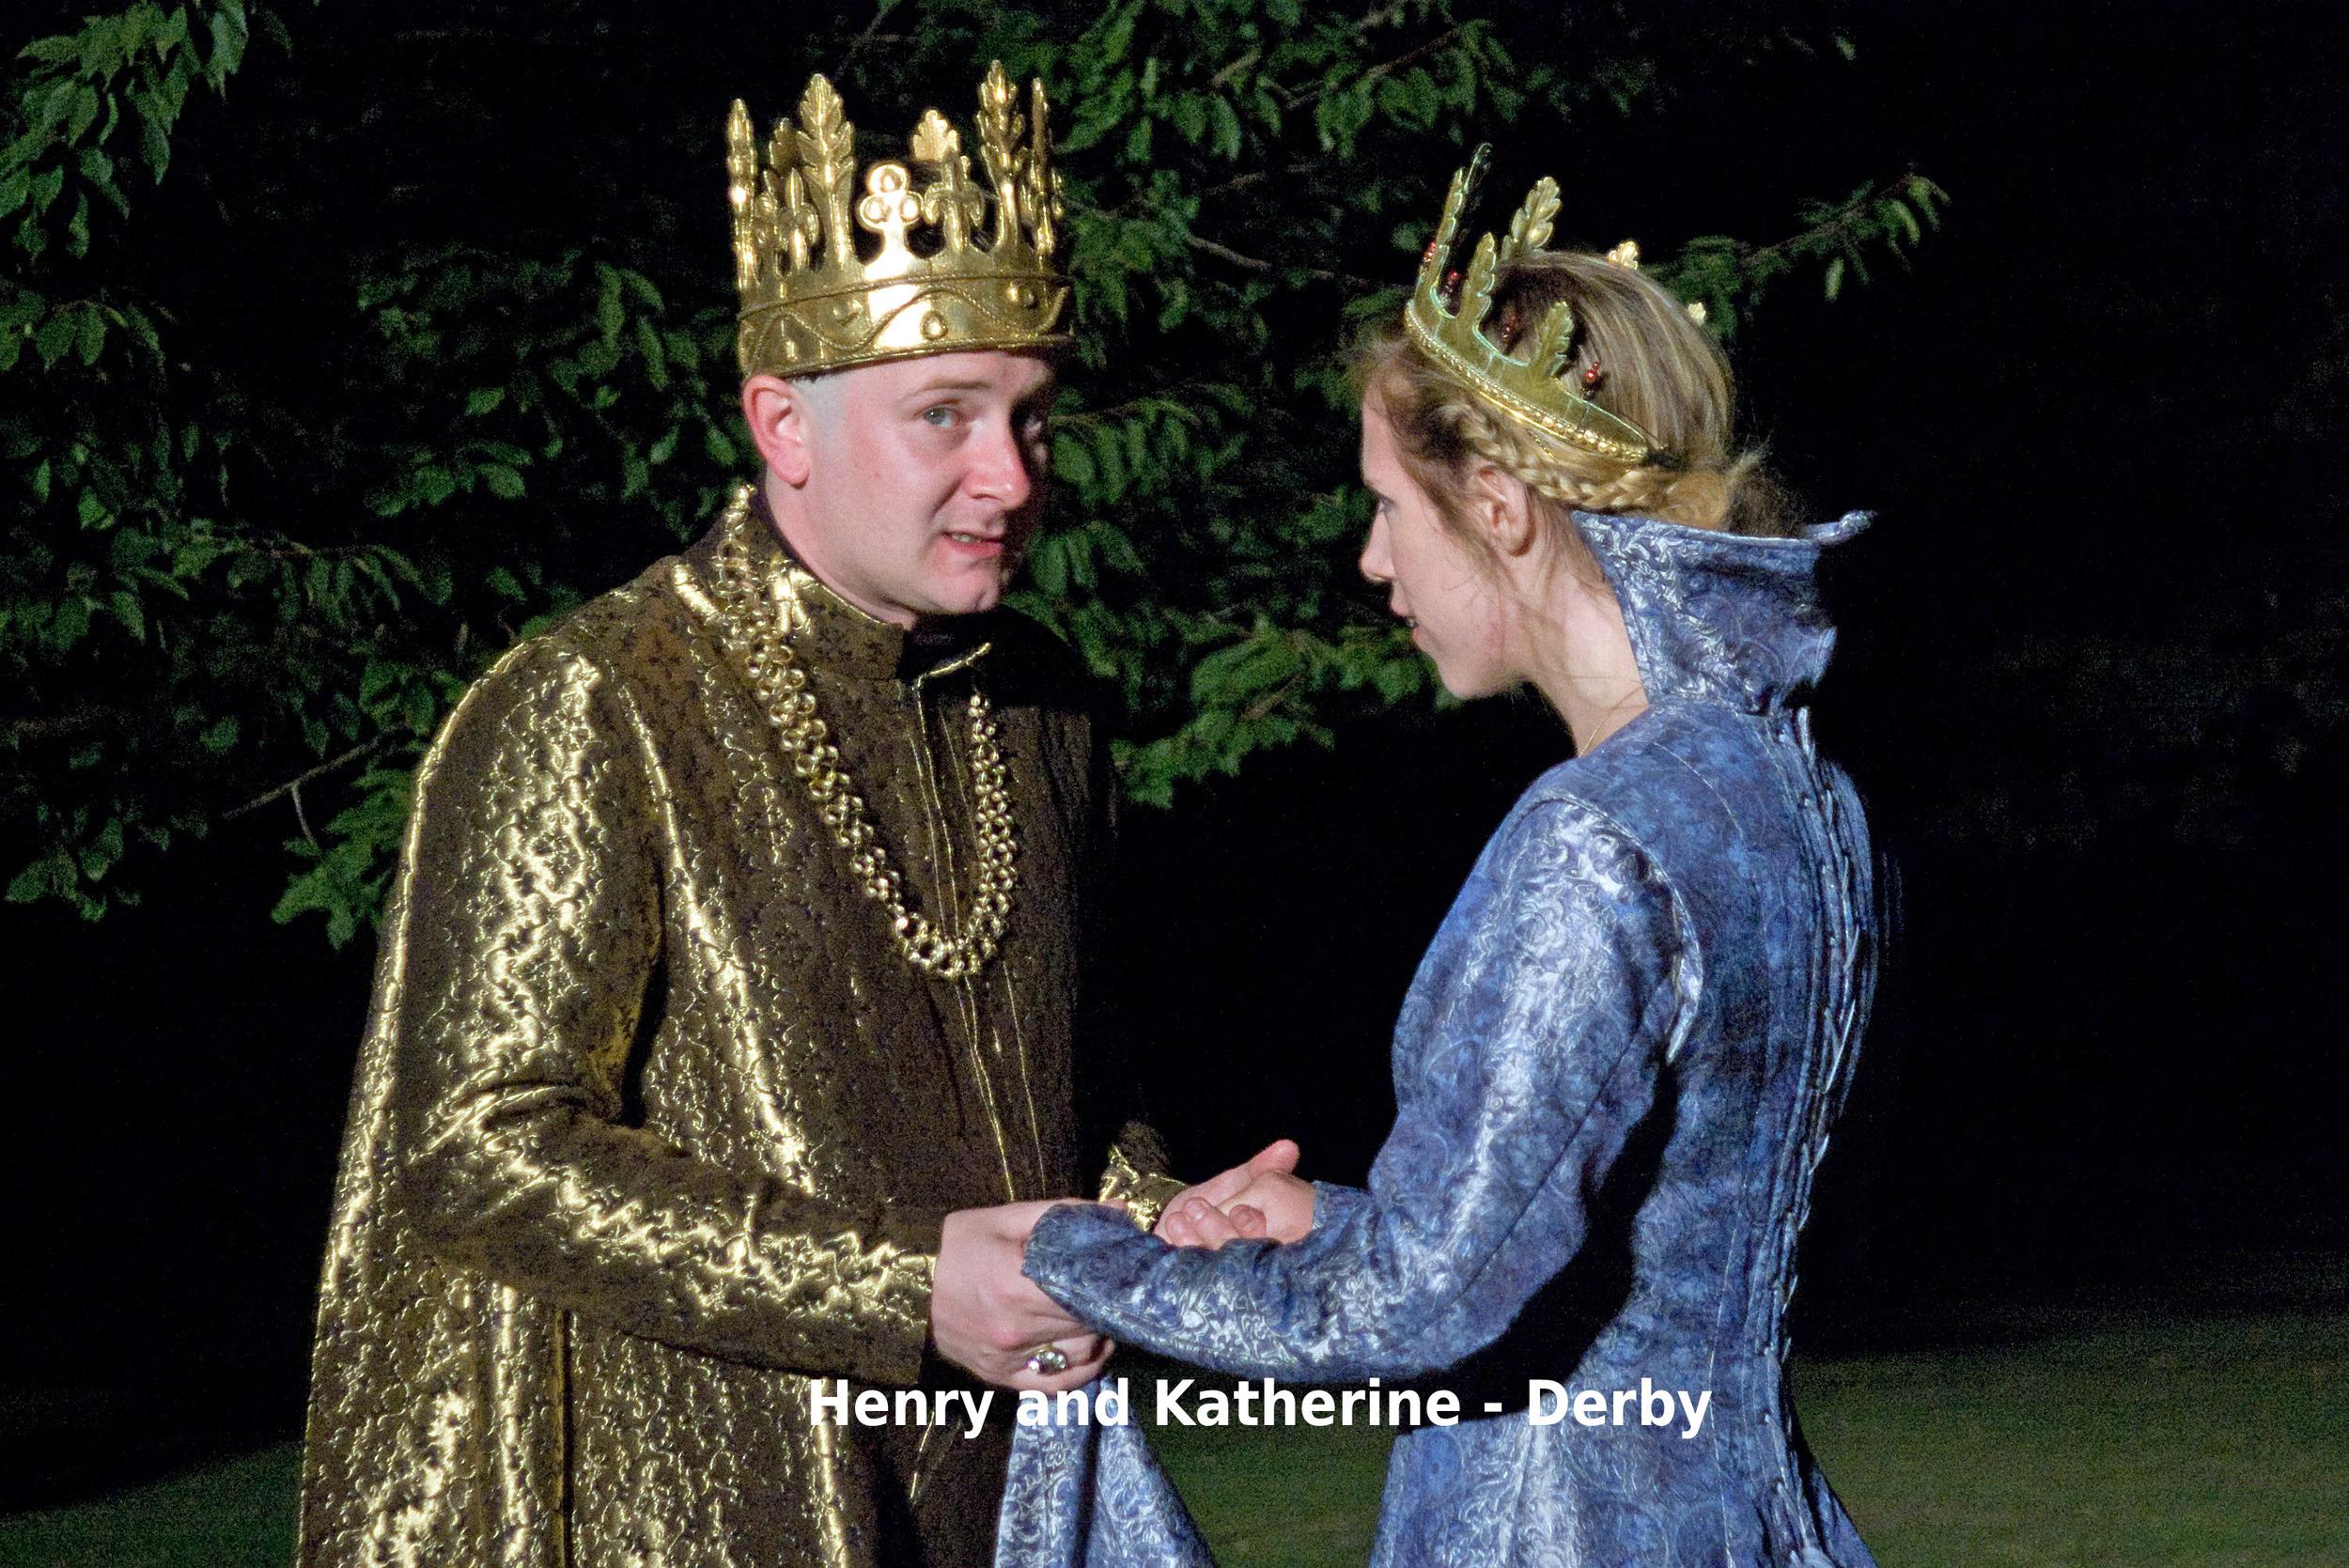 Henry and Katherine - Derby.jpg